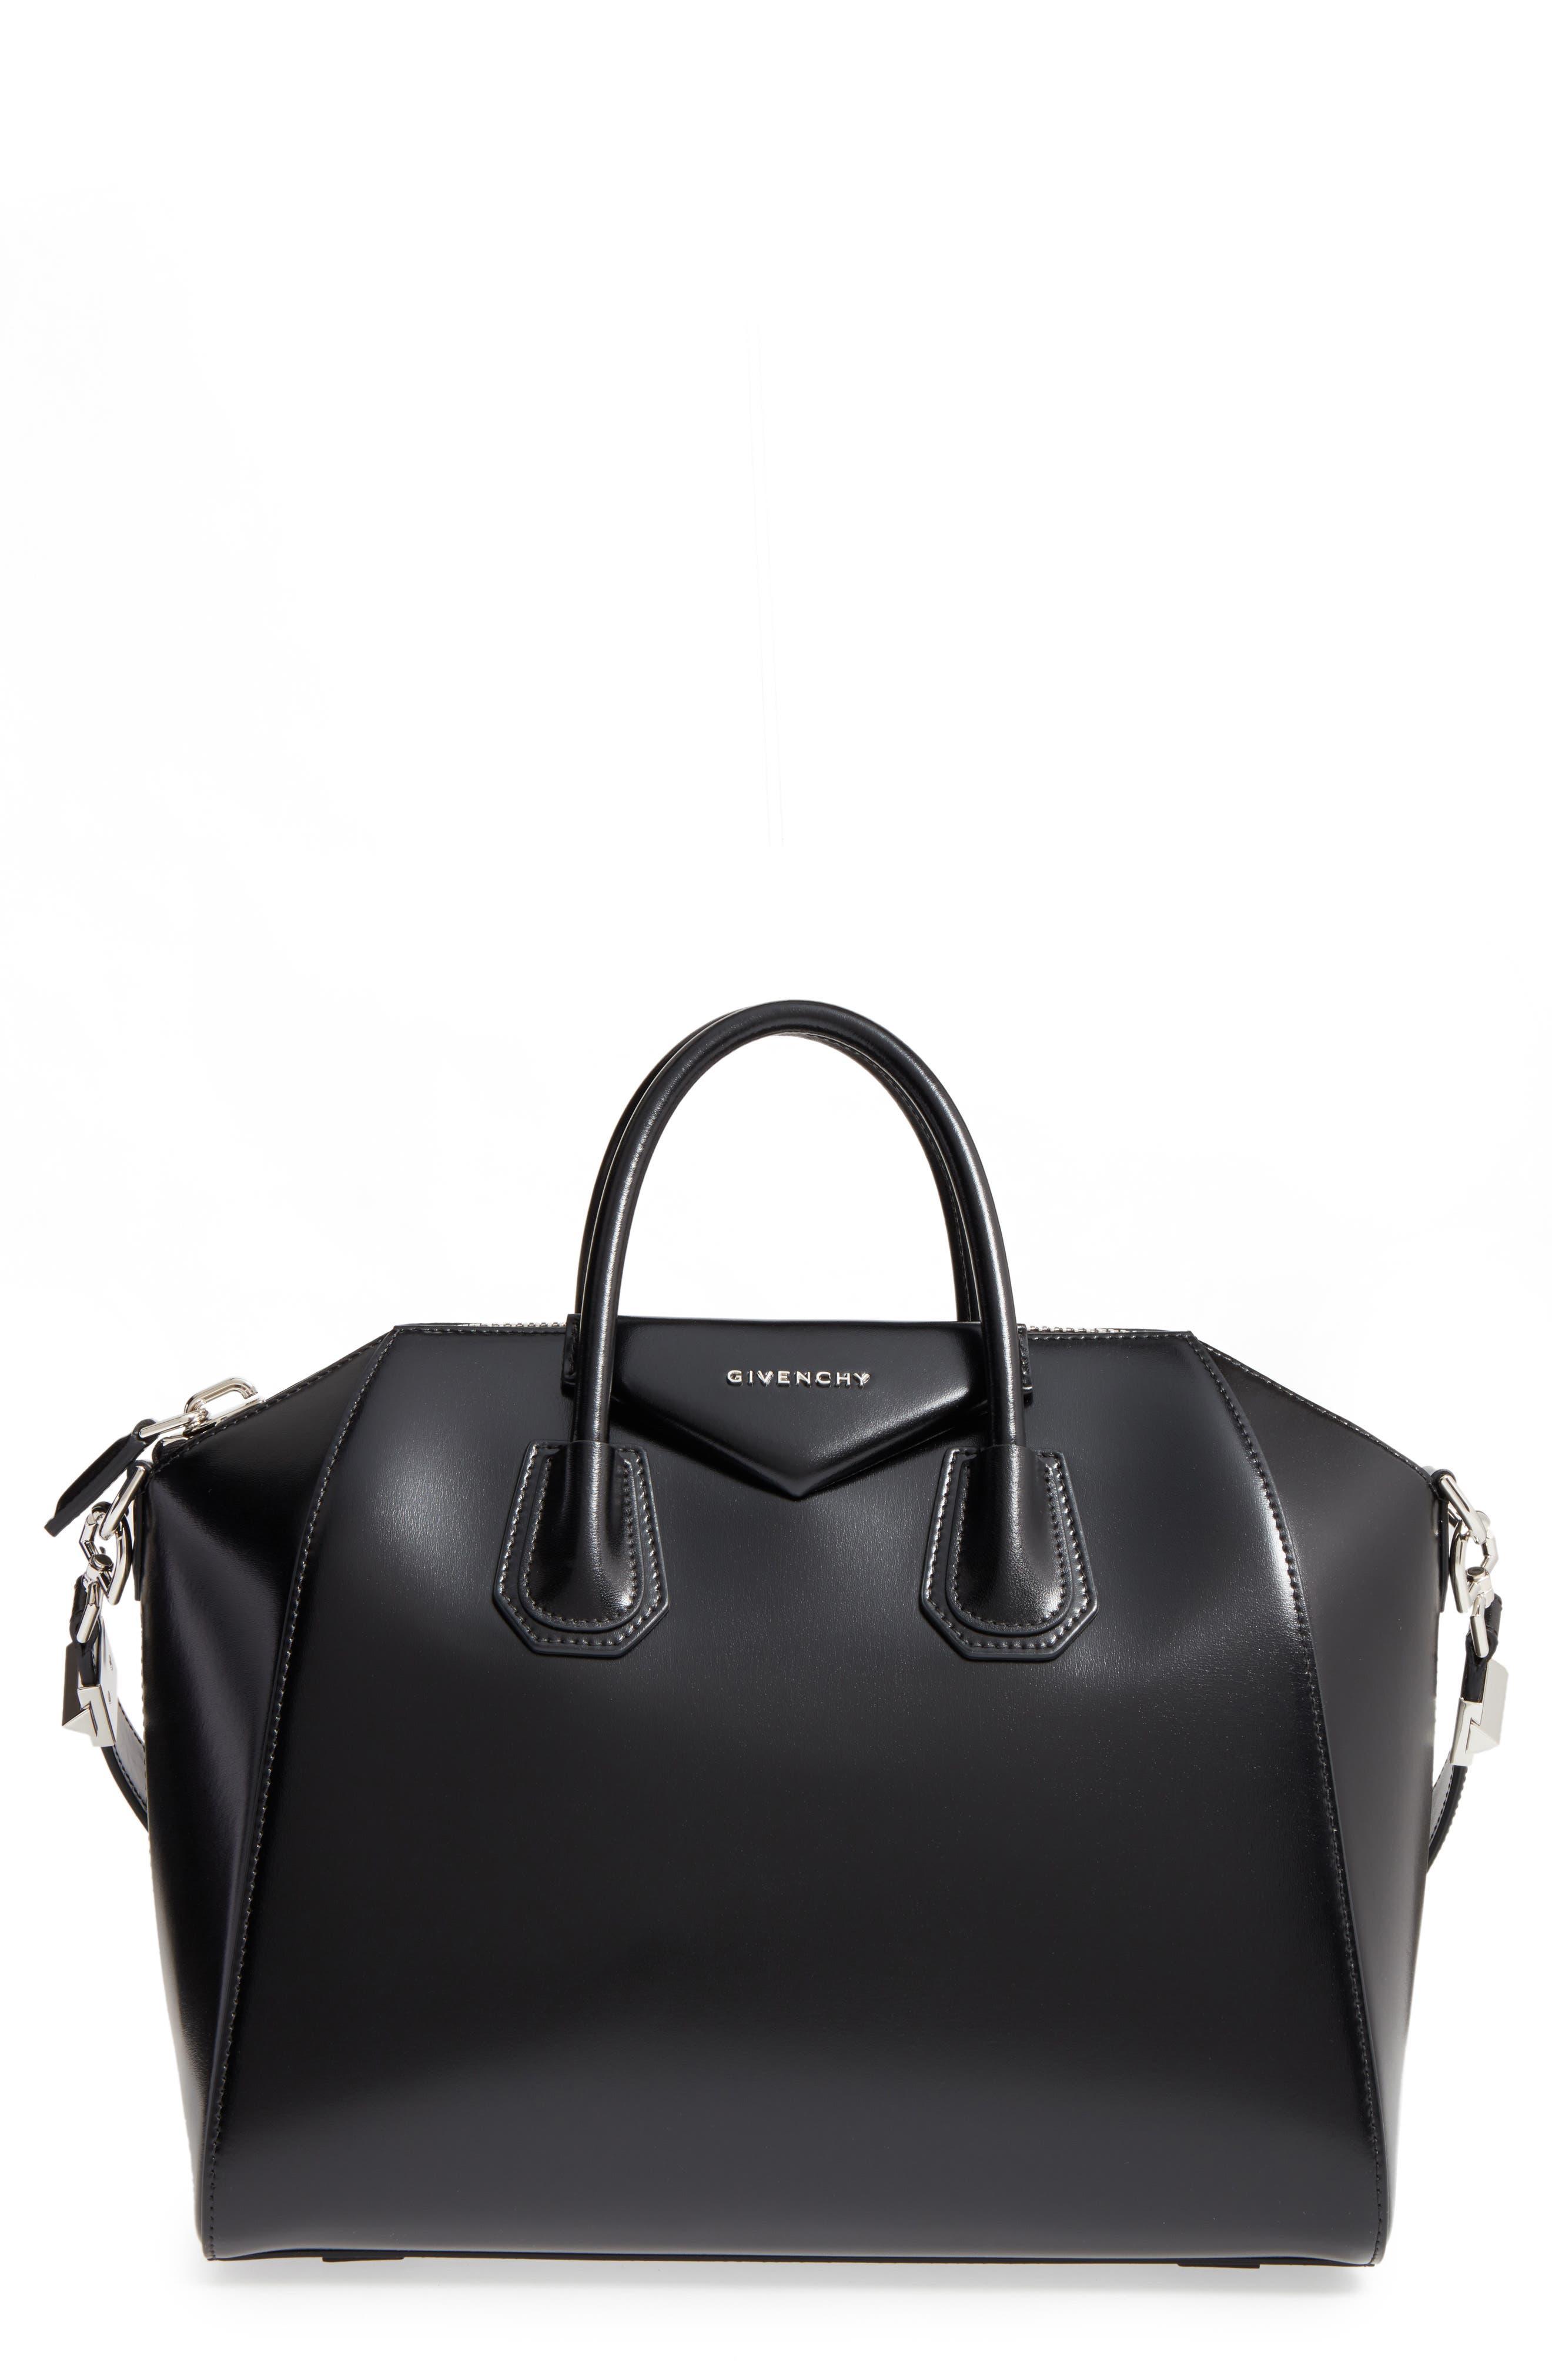 Medium Antigona Box Leather Satchel,                         Main,                         color, 001